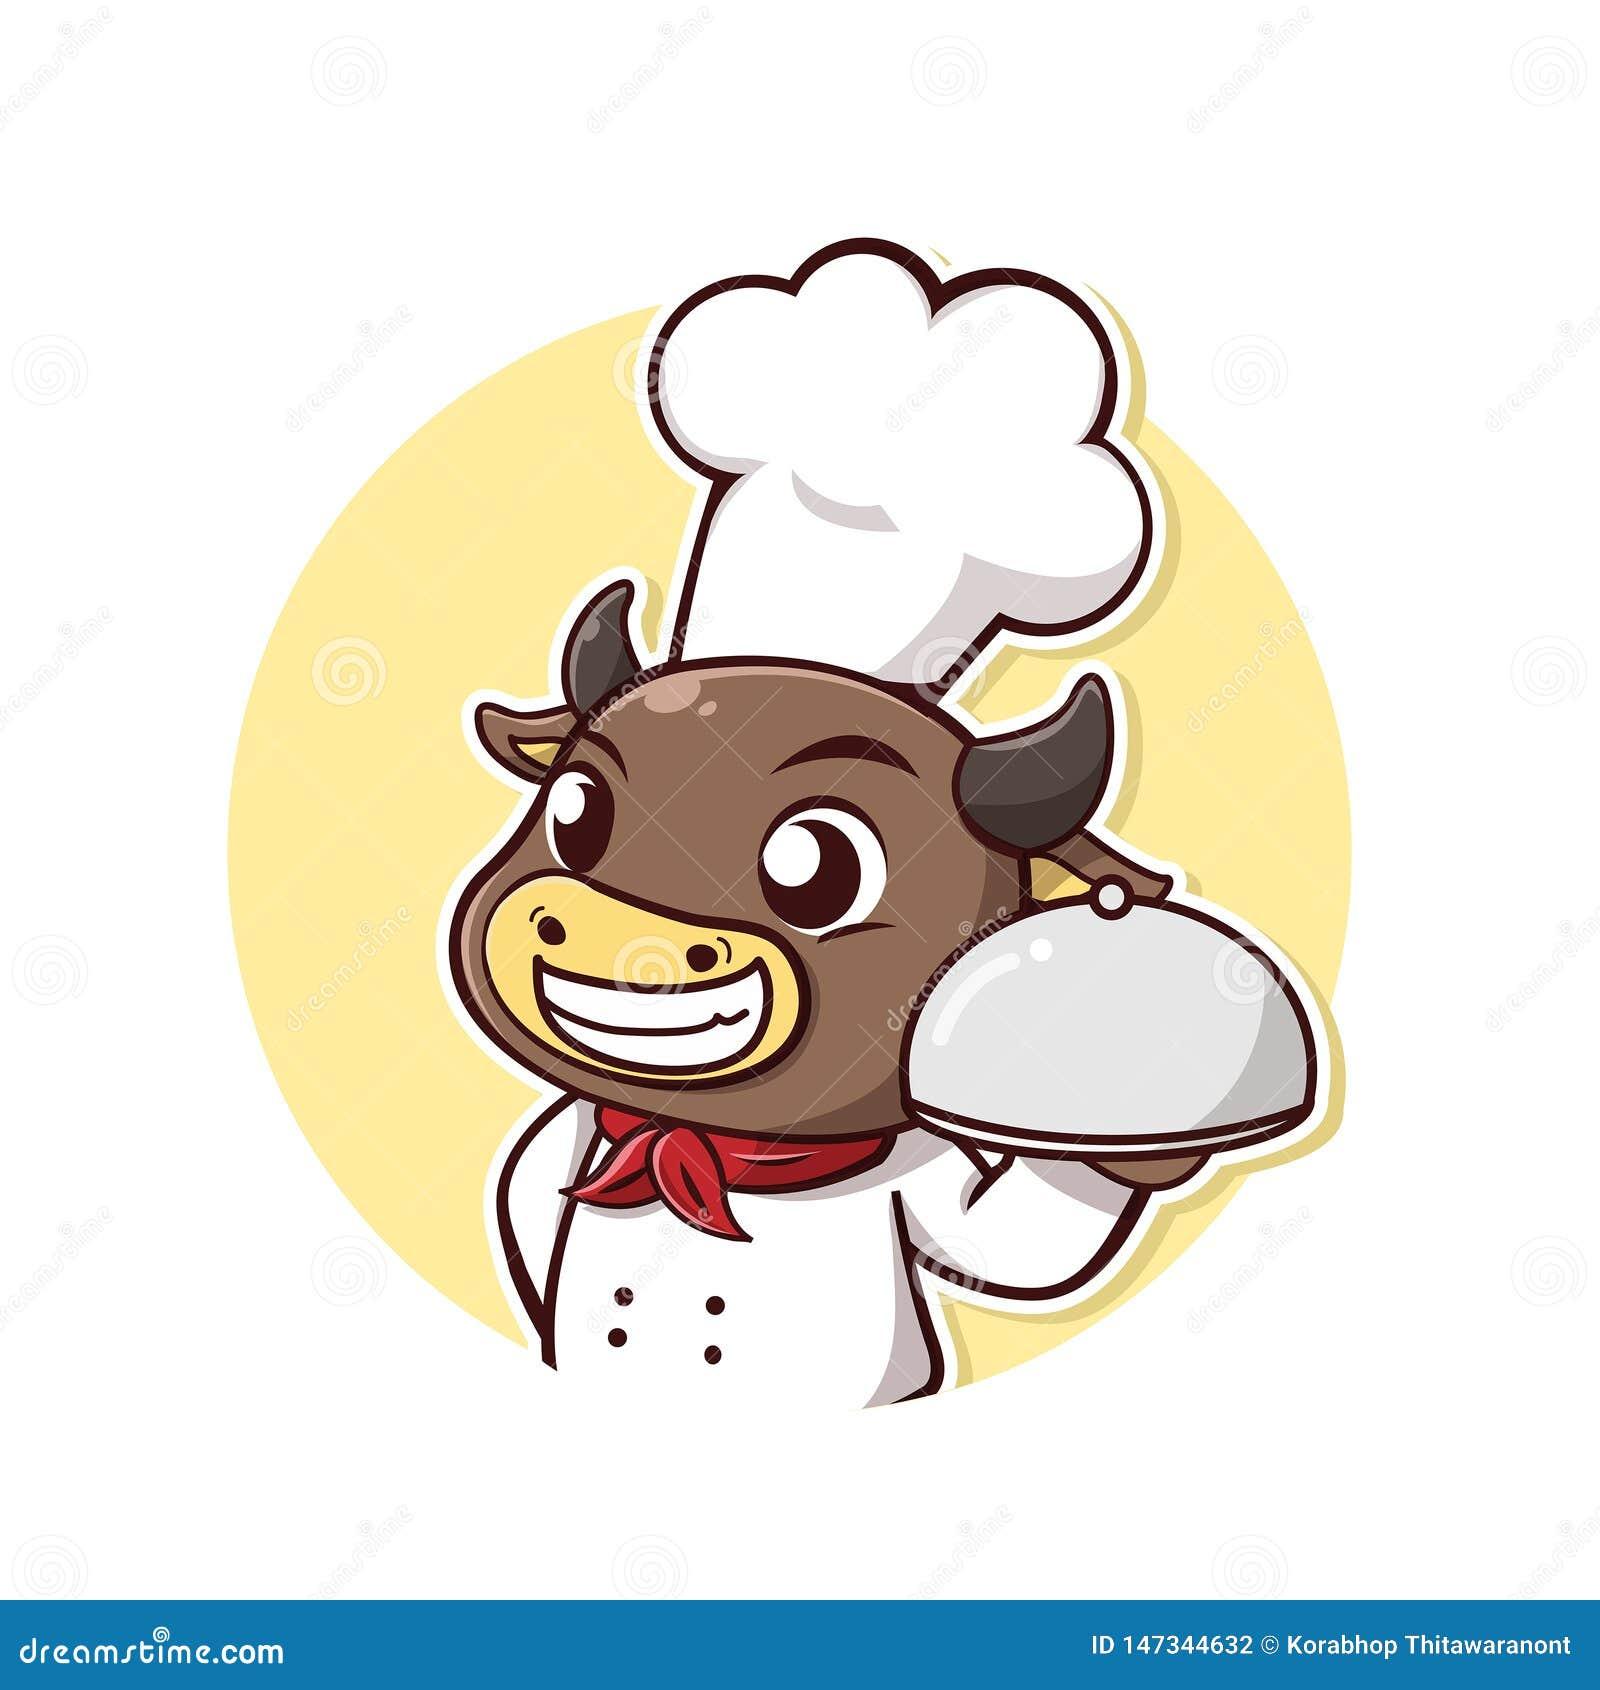 Bull steak chef smile and happy.